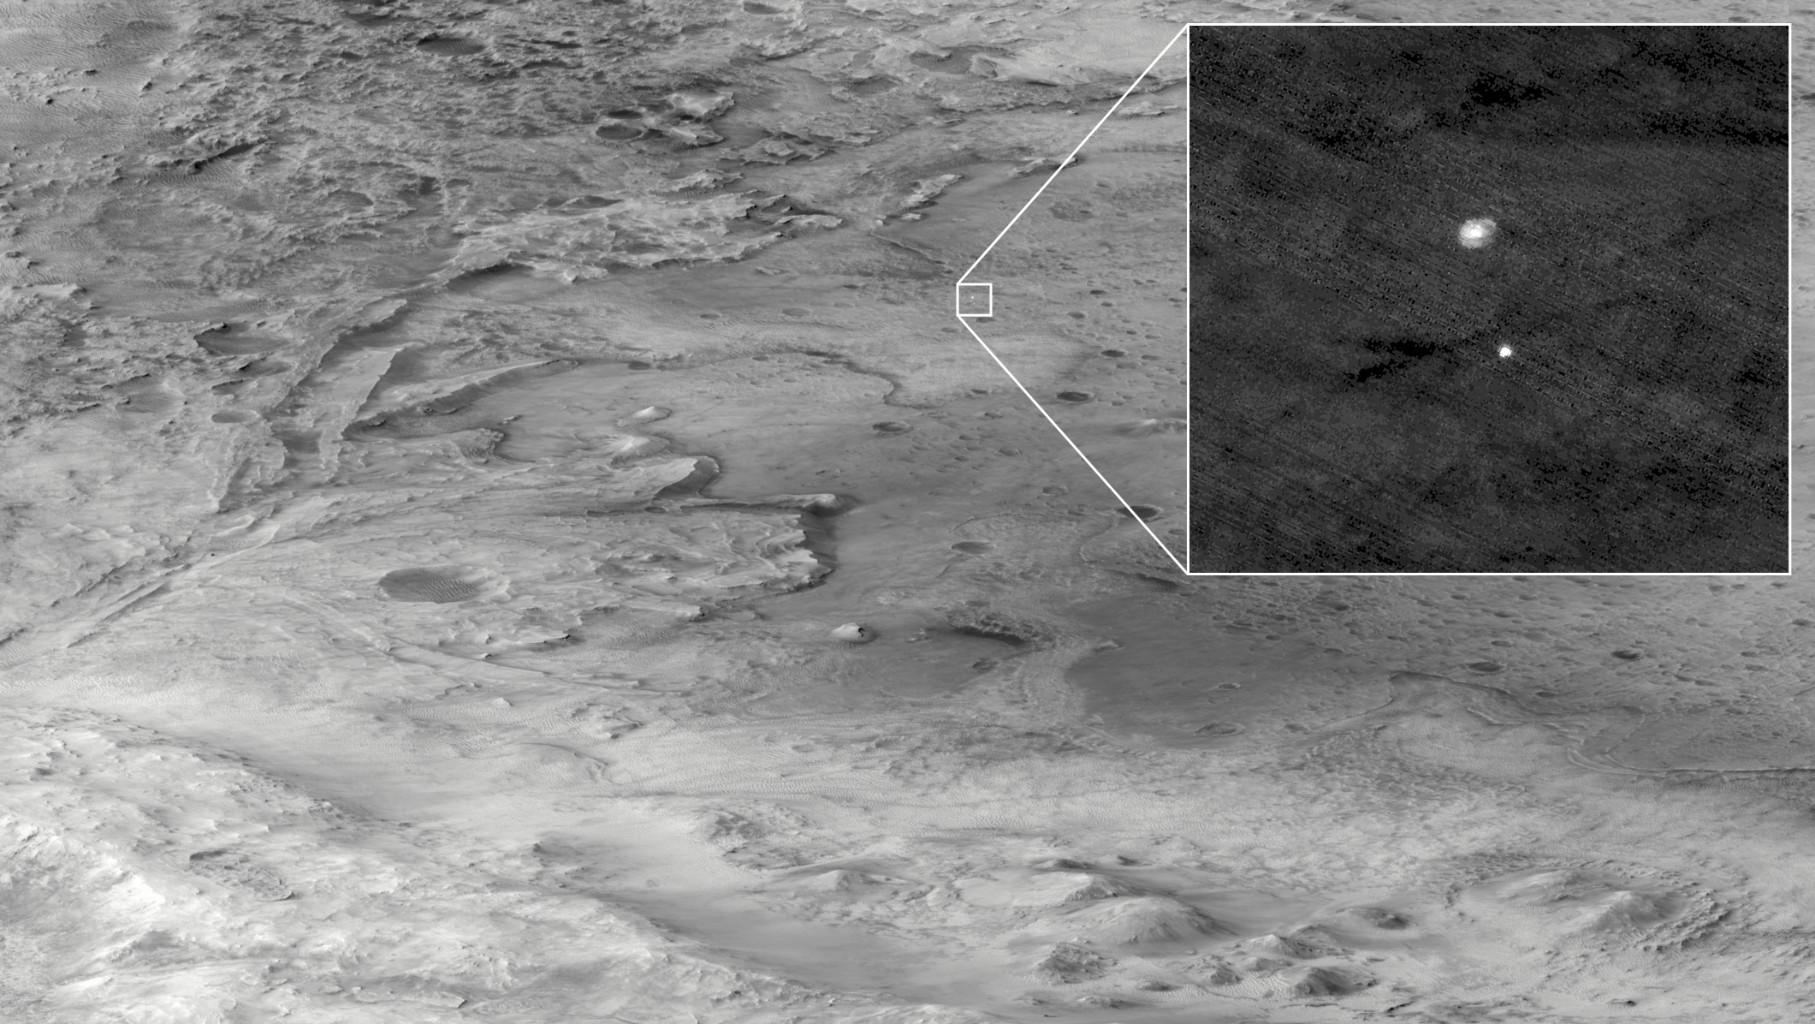 HiRISE observe Perseverance